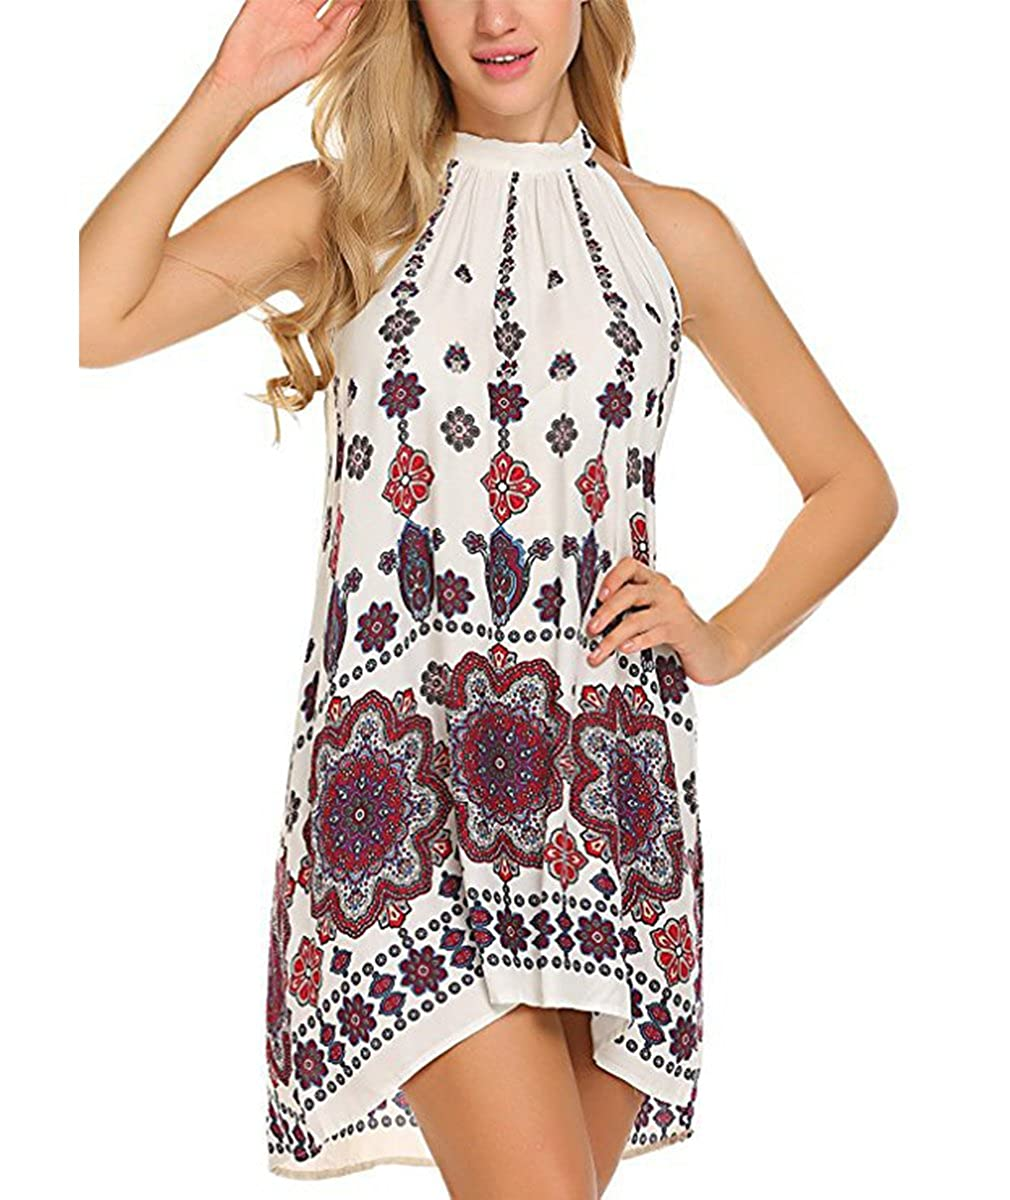 Clodsemi Damen Kleider Trägerkleid Langshirt Gedruckt Sommerkleid Strandkleid